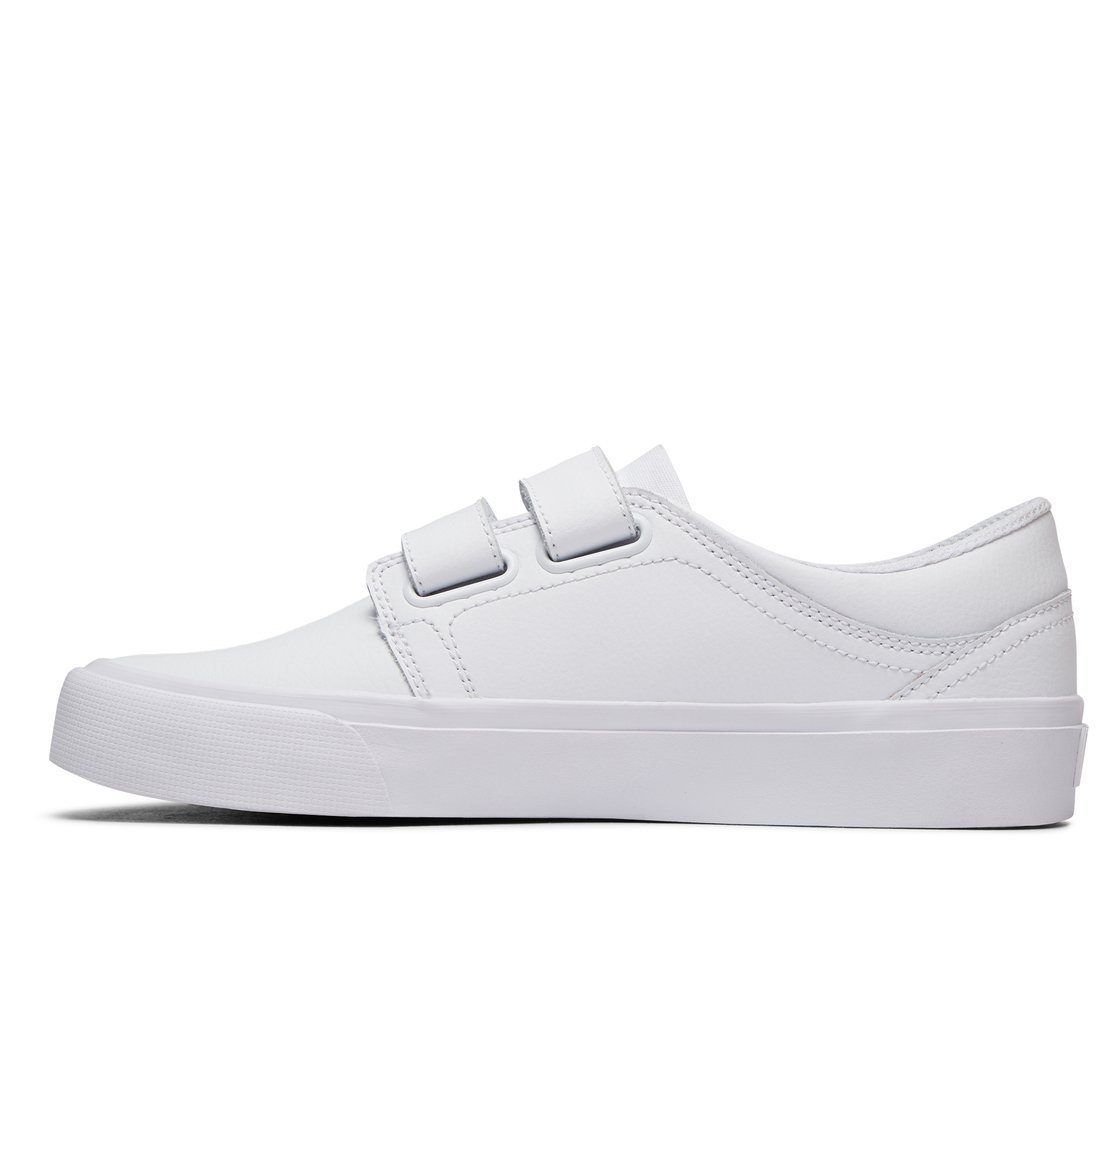 DC Shoes Schuhe Trase V SE online kaufen  White#ft5_slash#white#ft5_slash#athletic red